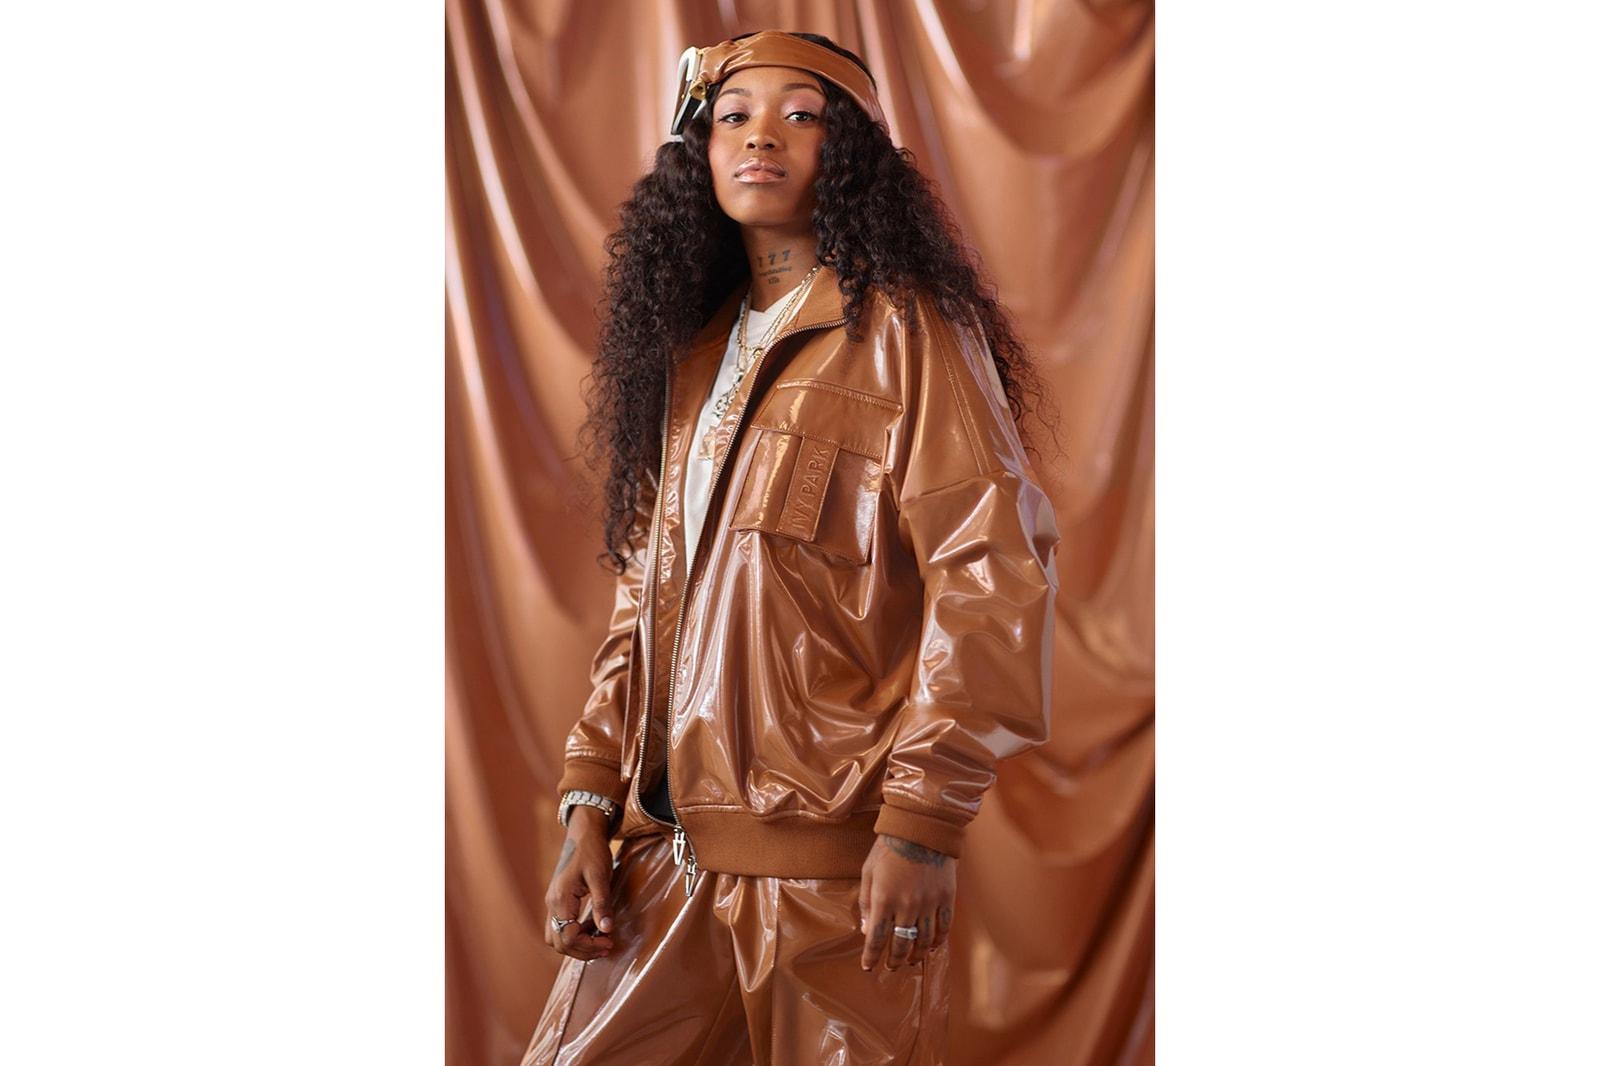 Beyoncé IVY PARK x adidas ICY PARK Collection Lookbook